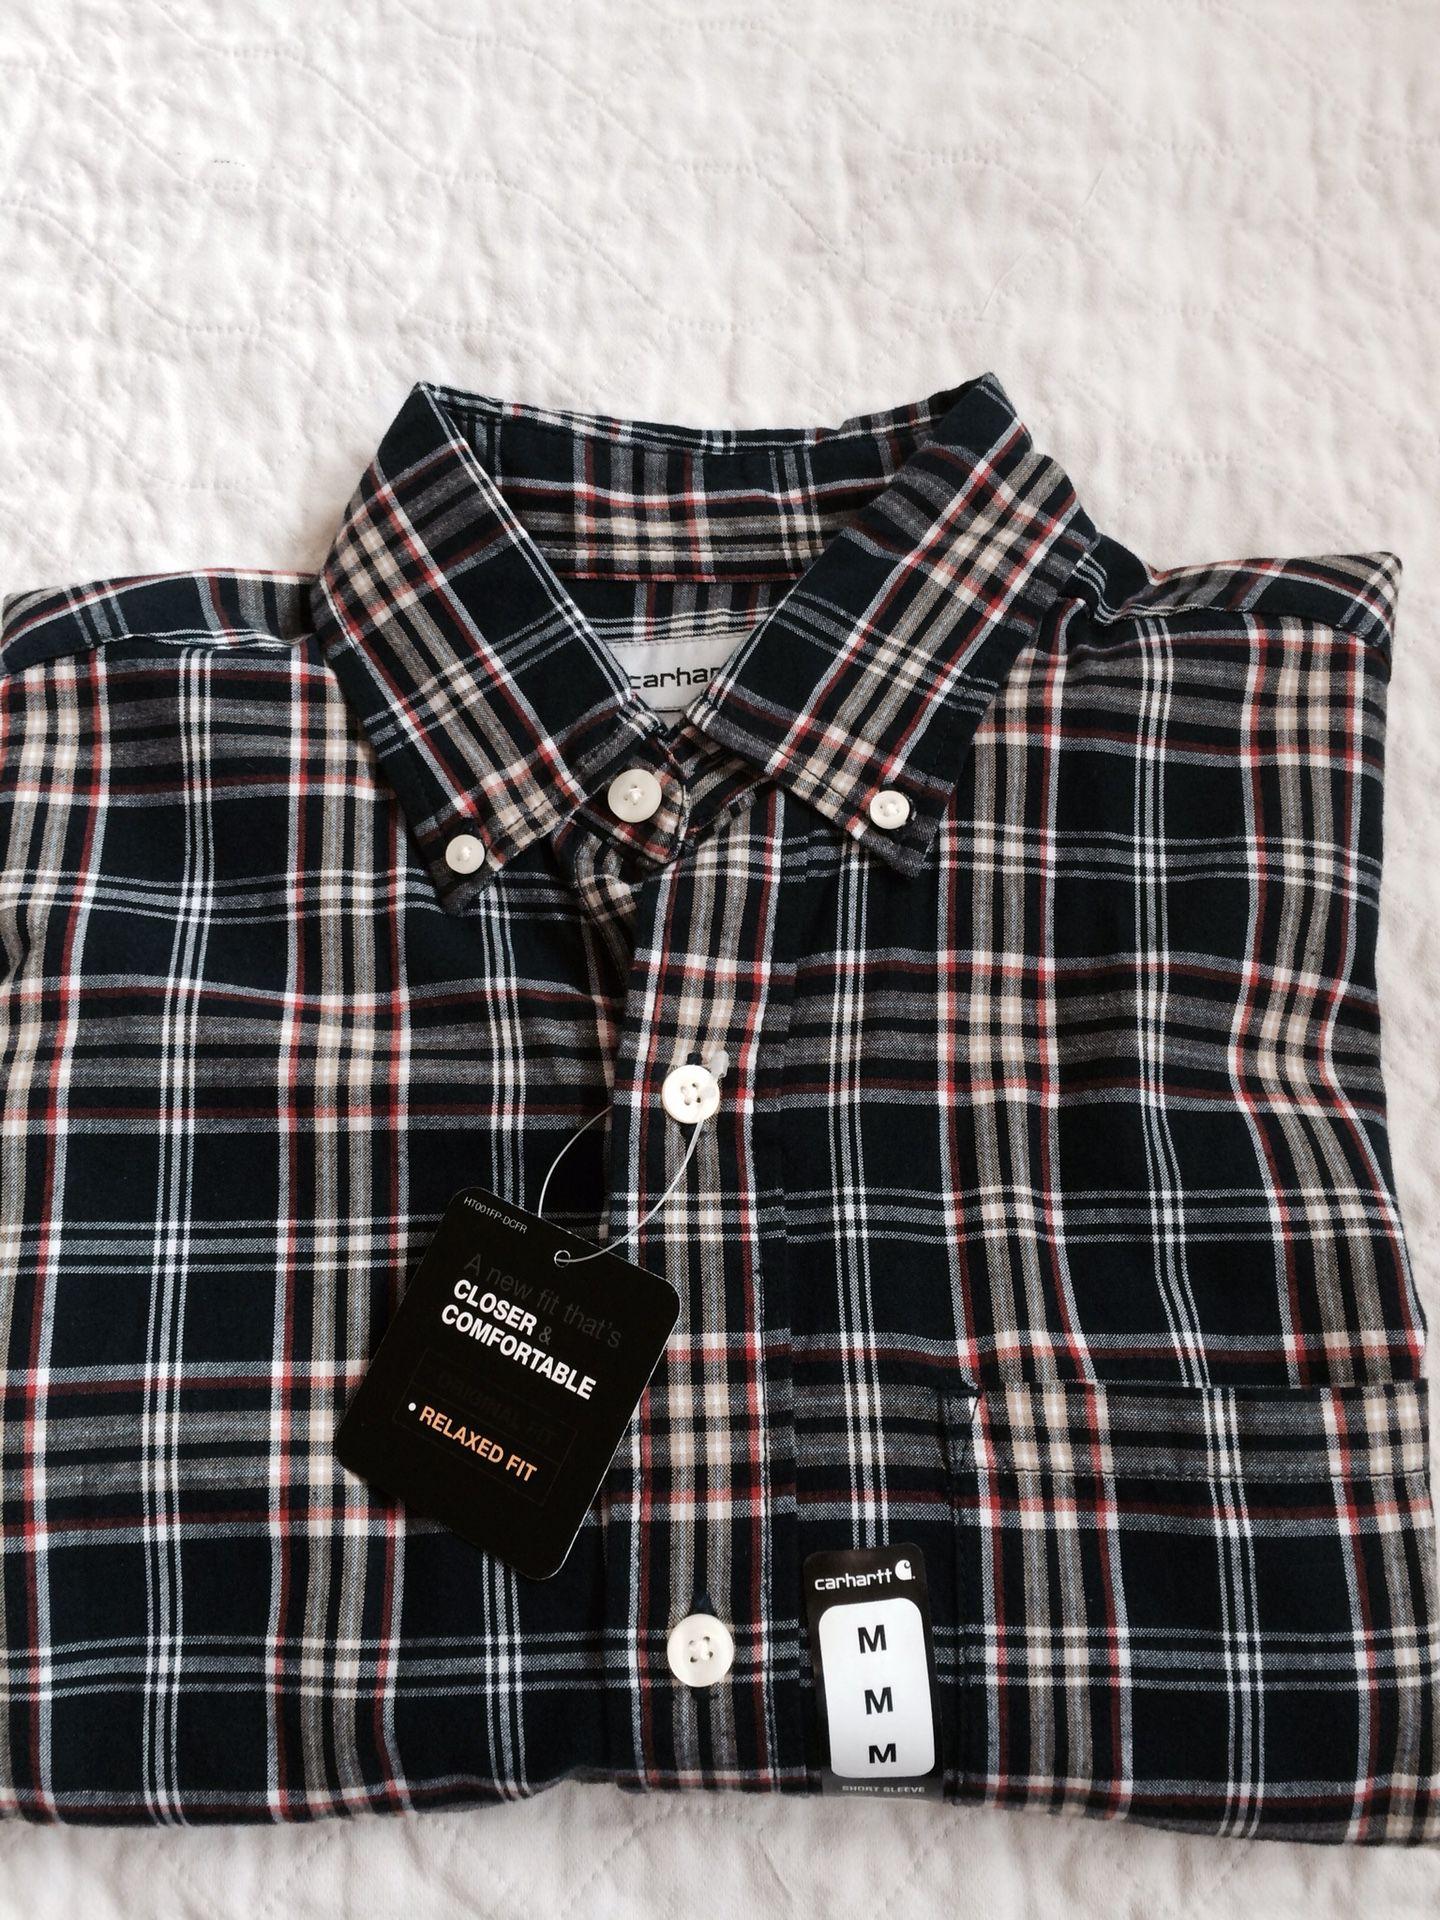 Carhart men's short sleeve shirt. Size medium